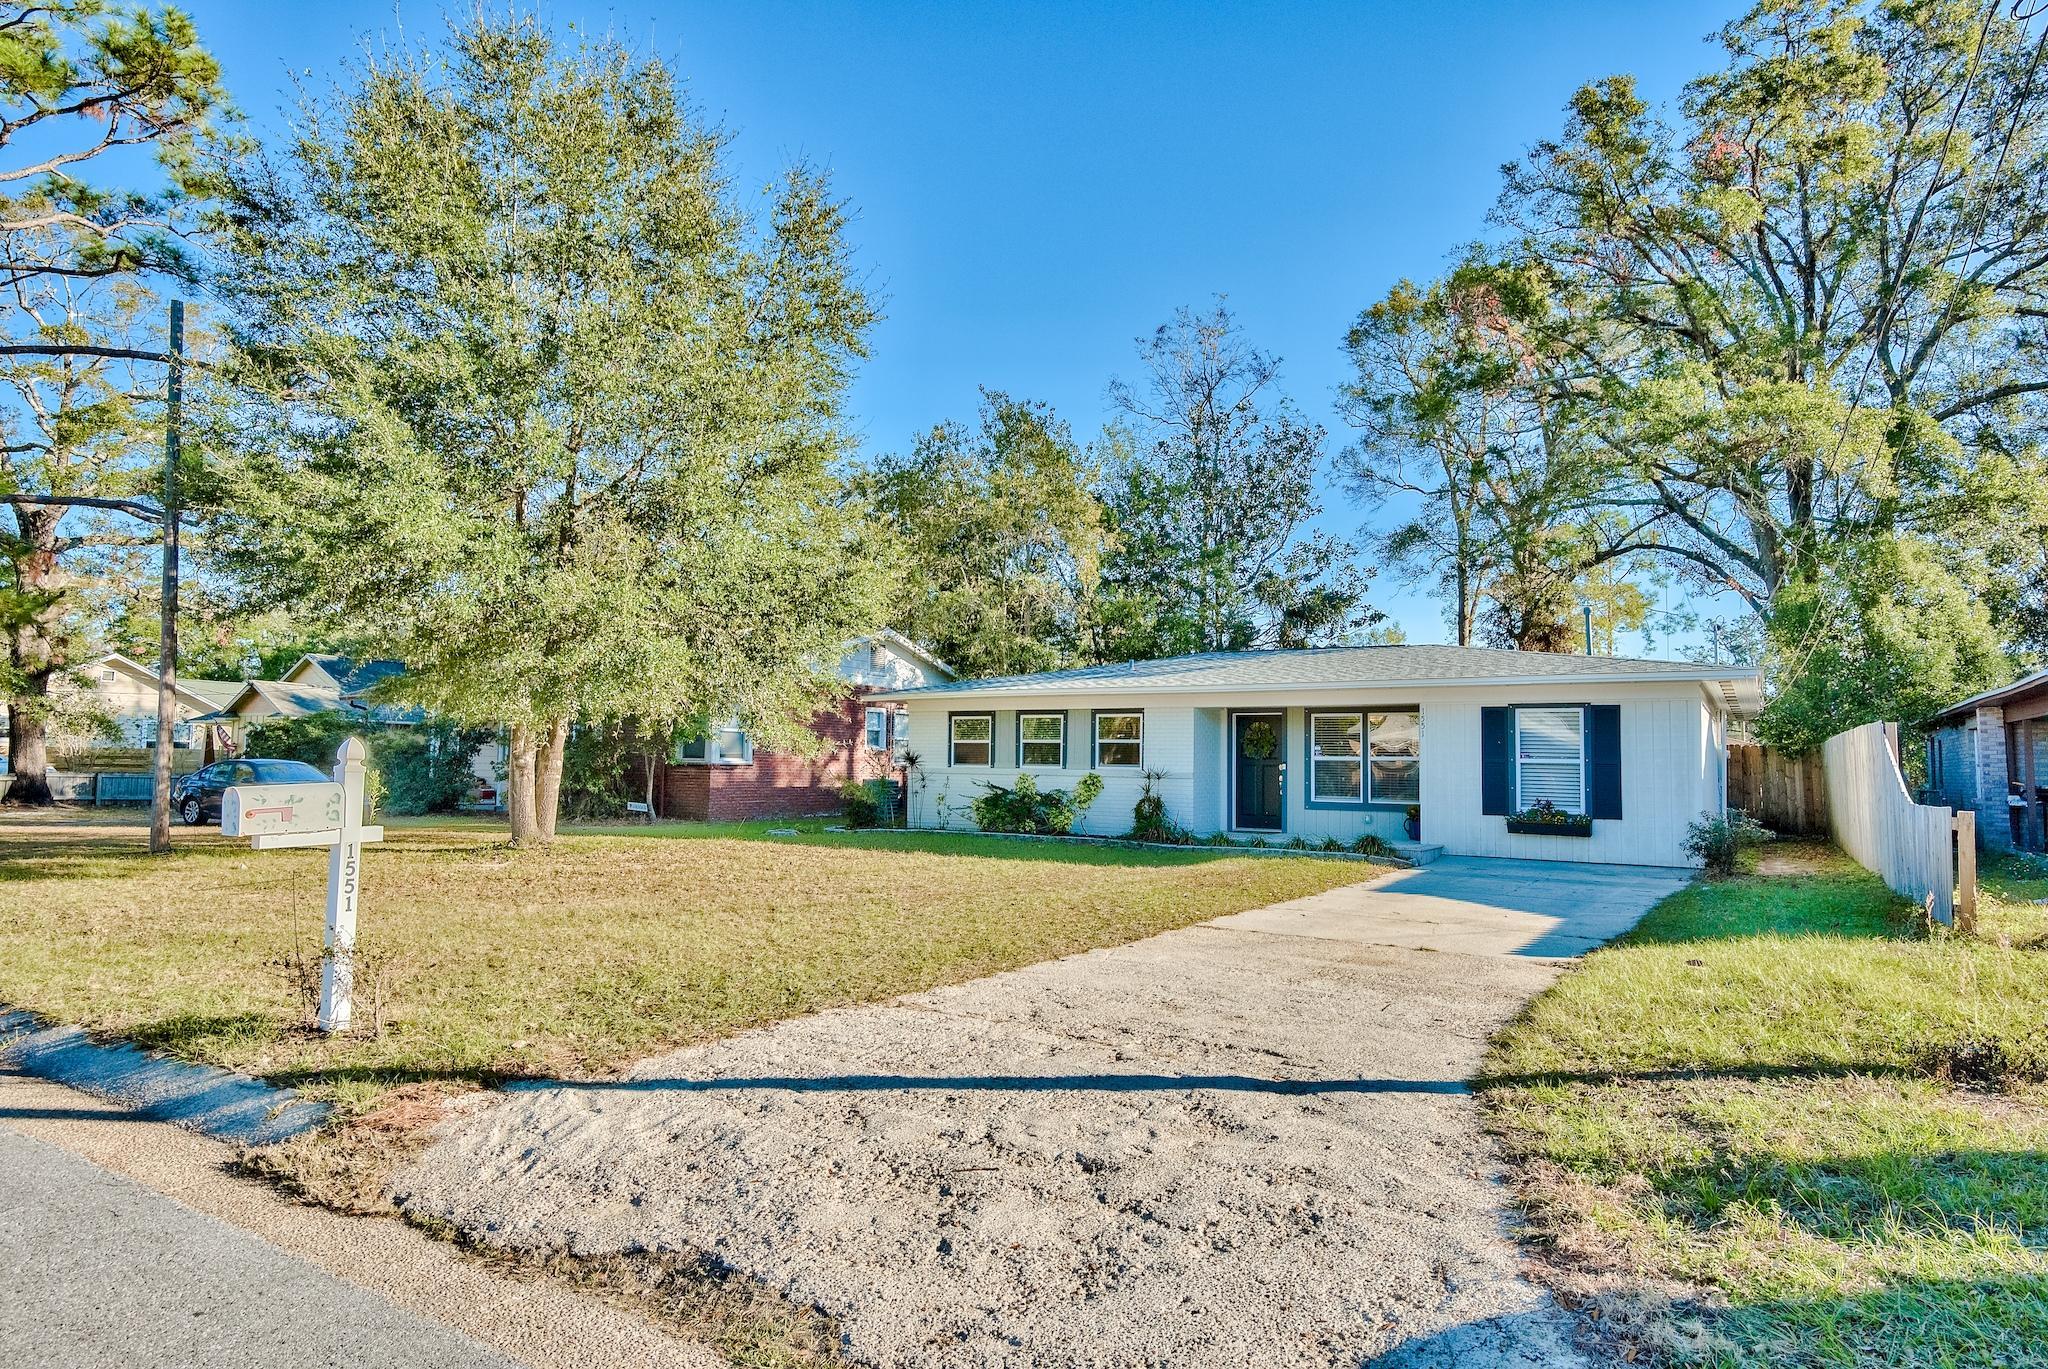 1551 Baars St, Pensacola, FL, 32503